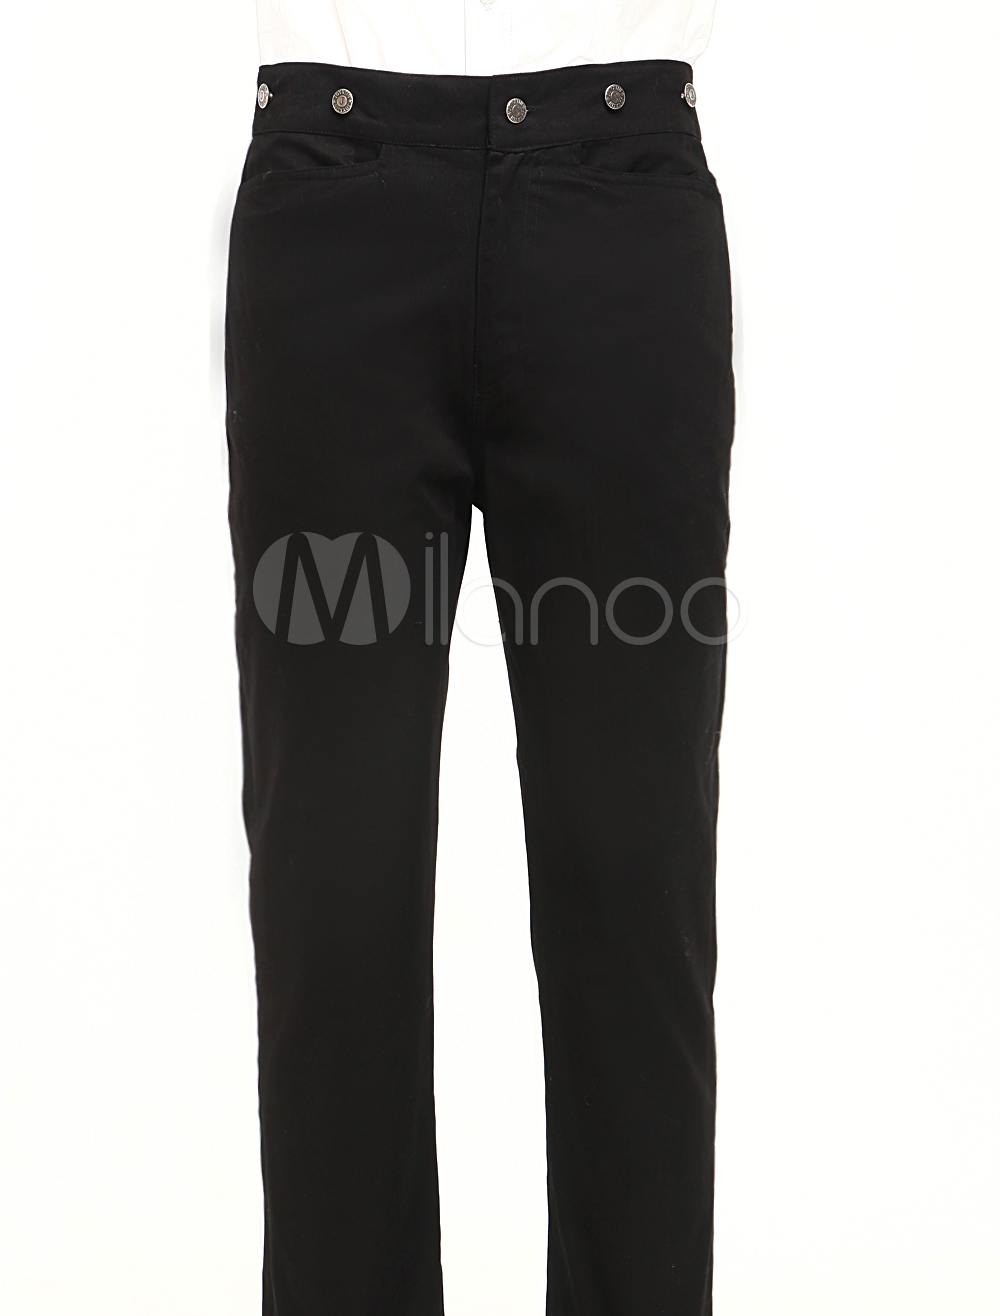 #Milanoo.com Ltd          #Steampunk  Trousers      #Classic #Black #Cotton #Mens #Steampunk #Trousers  Classic Black Cotton Mens Steampunk Trousers                                  http://www.seapai.com/product.aspx?PID=5717999